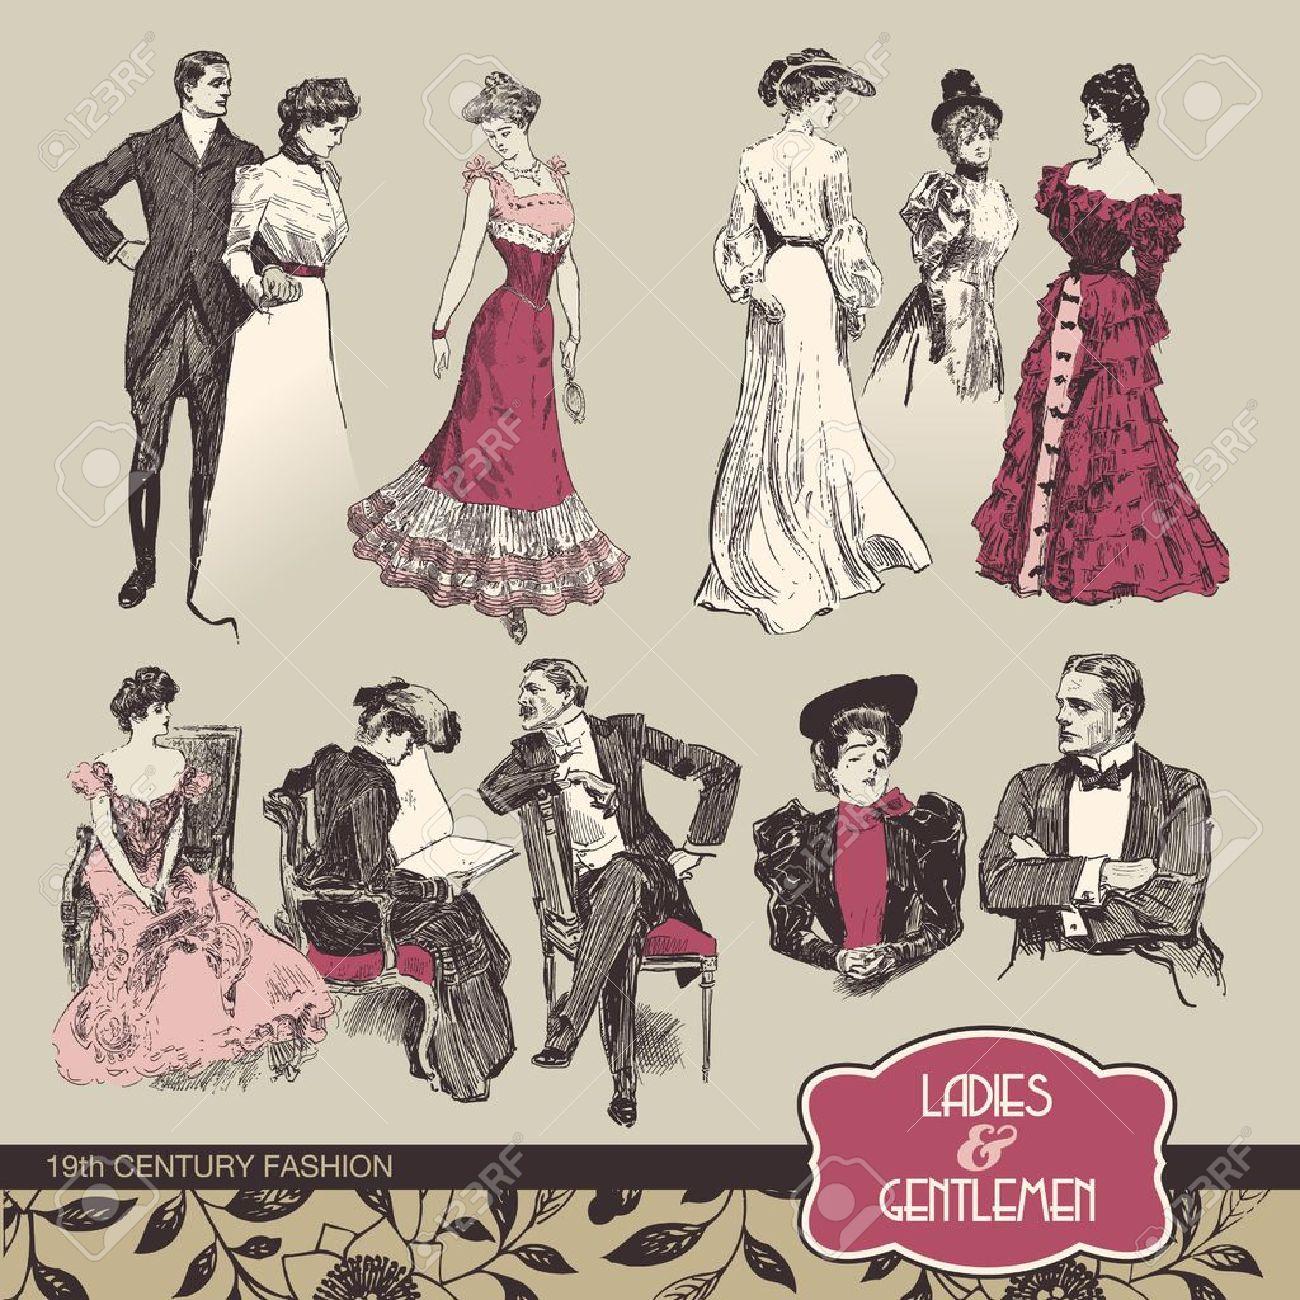 Ladies and gentlemen 19th century fashion - 10917861